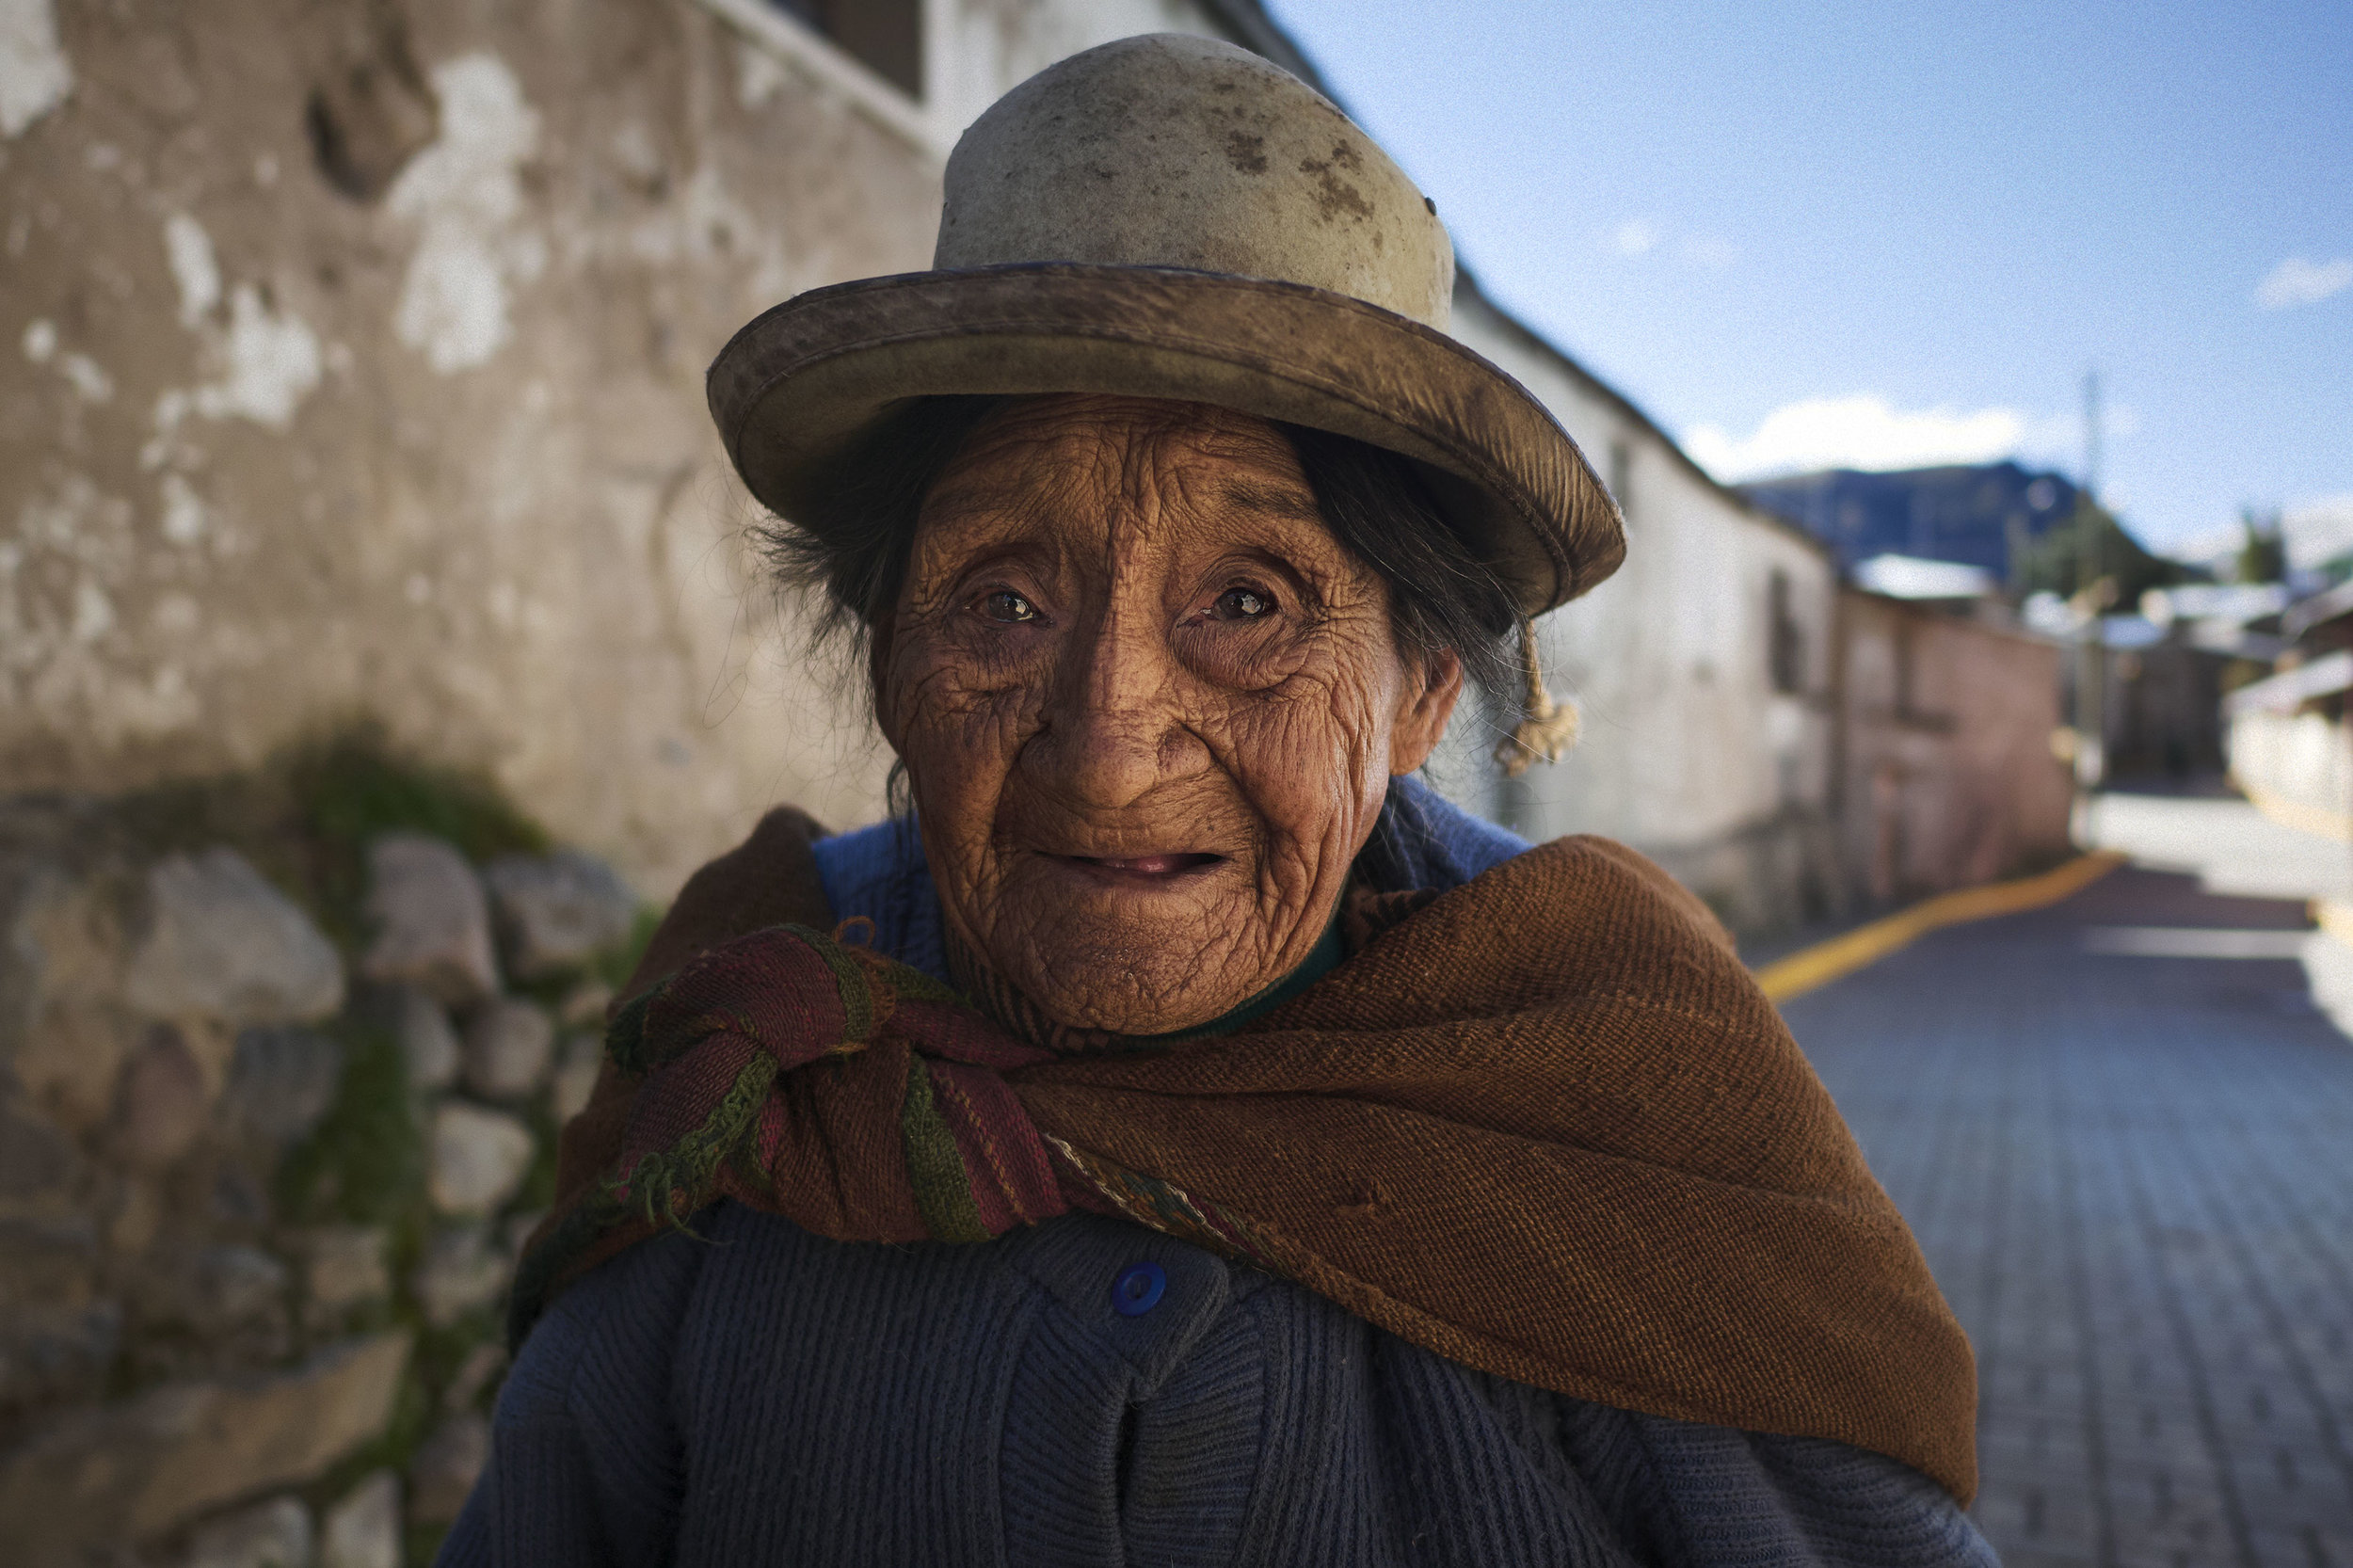 Quechua woman in a town